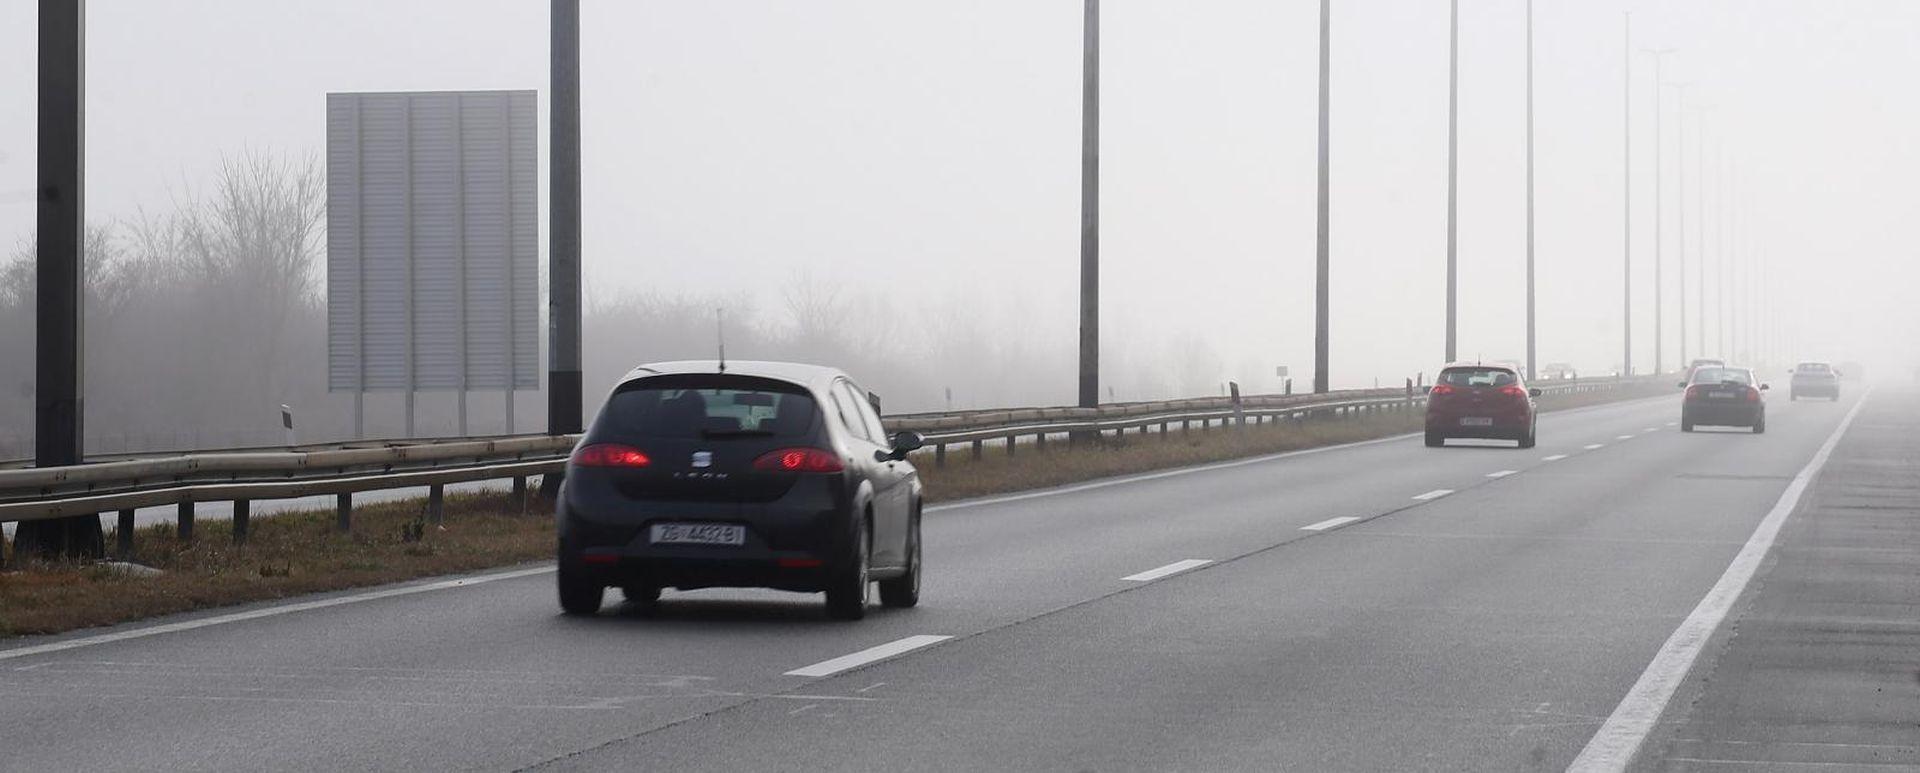 Magla smanjuje vidljivost, otežano na zagrebačkoj obilaznici